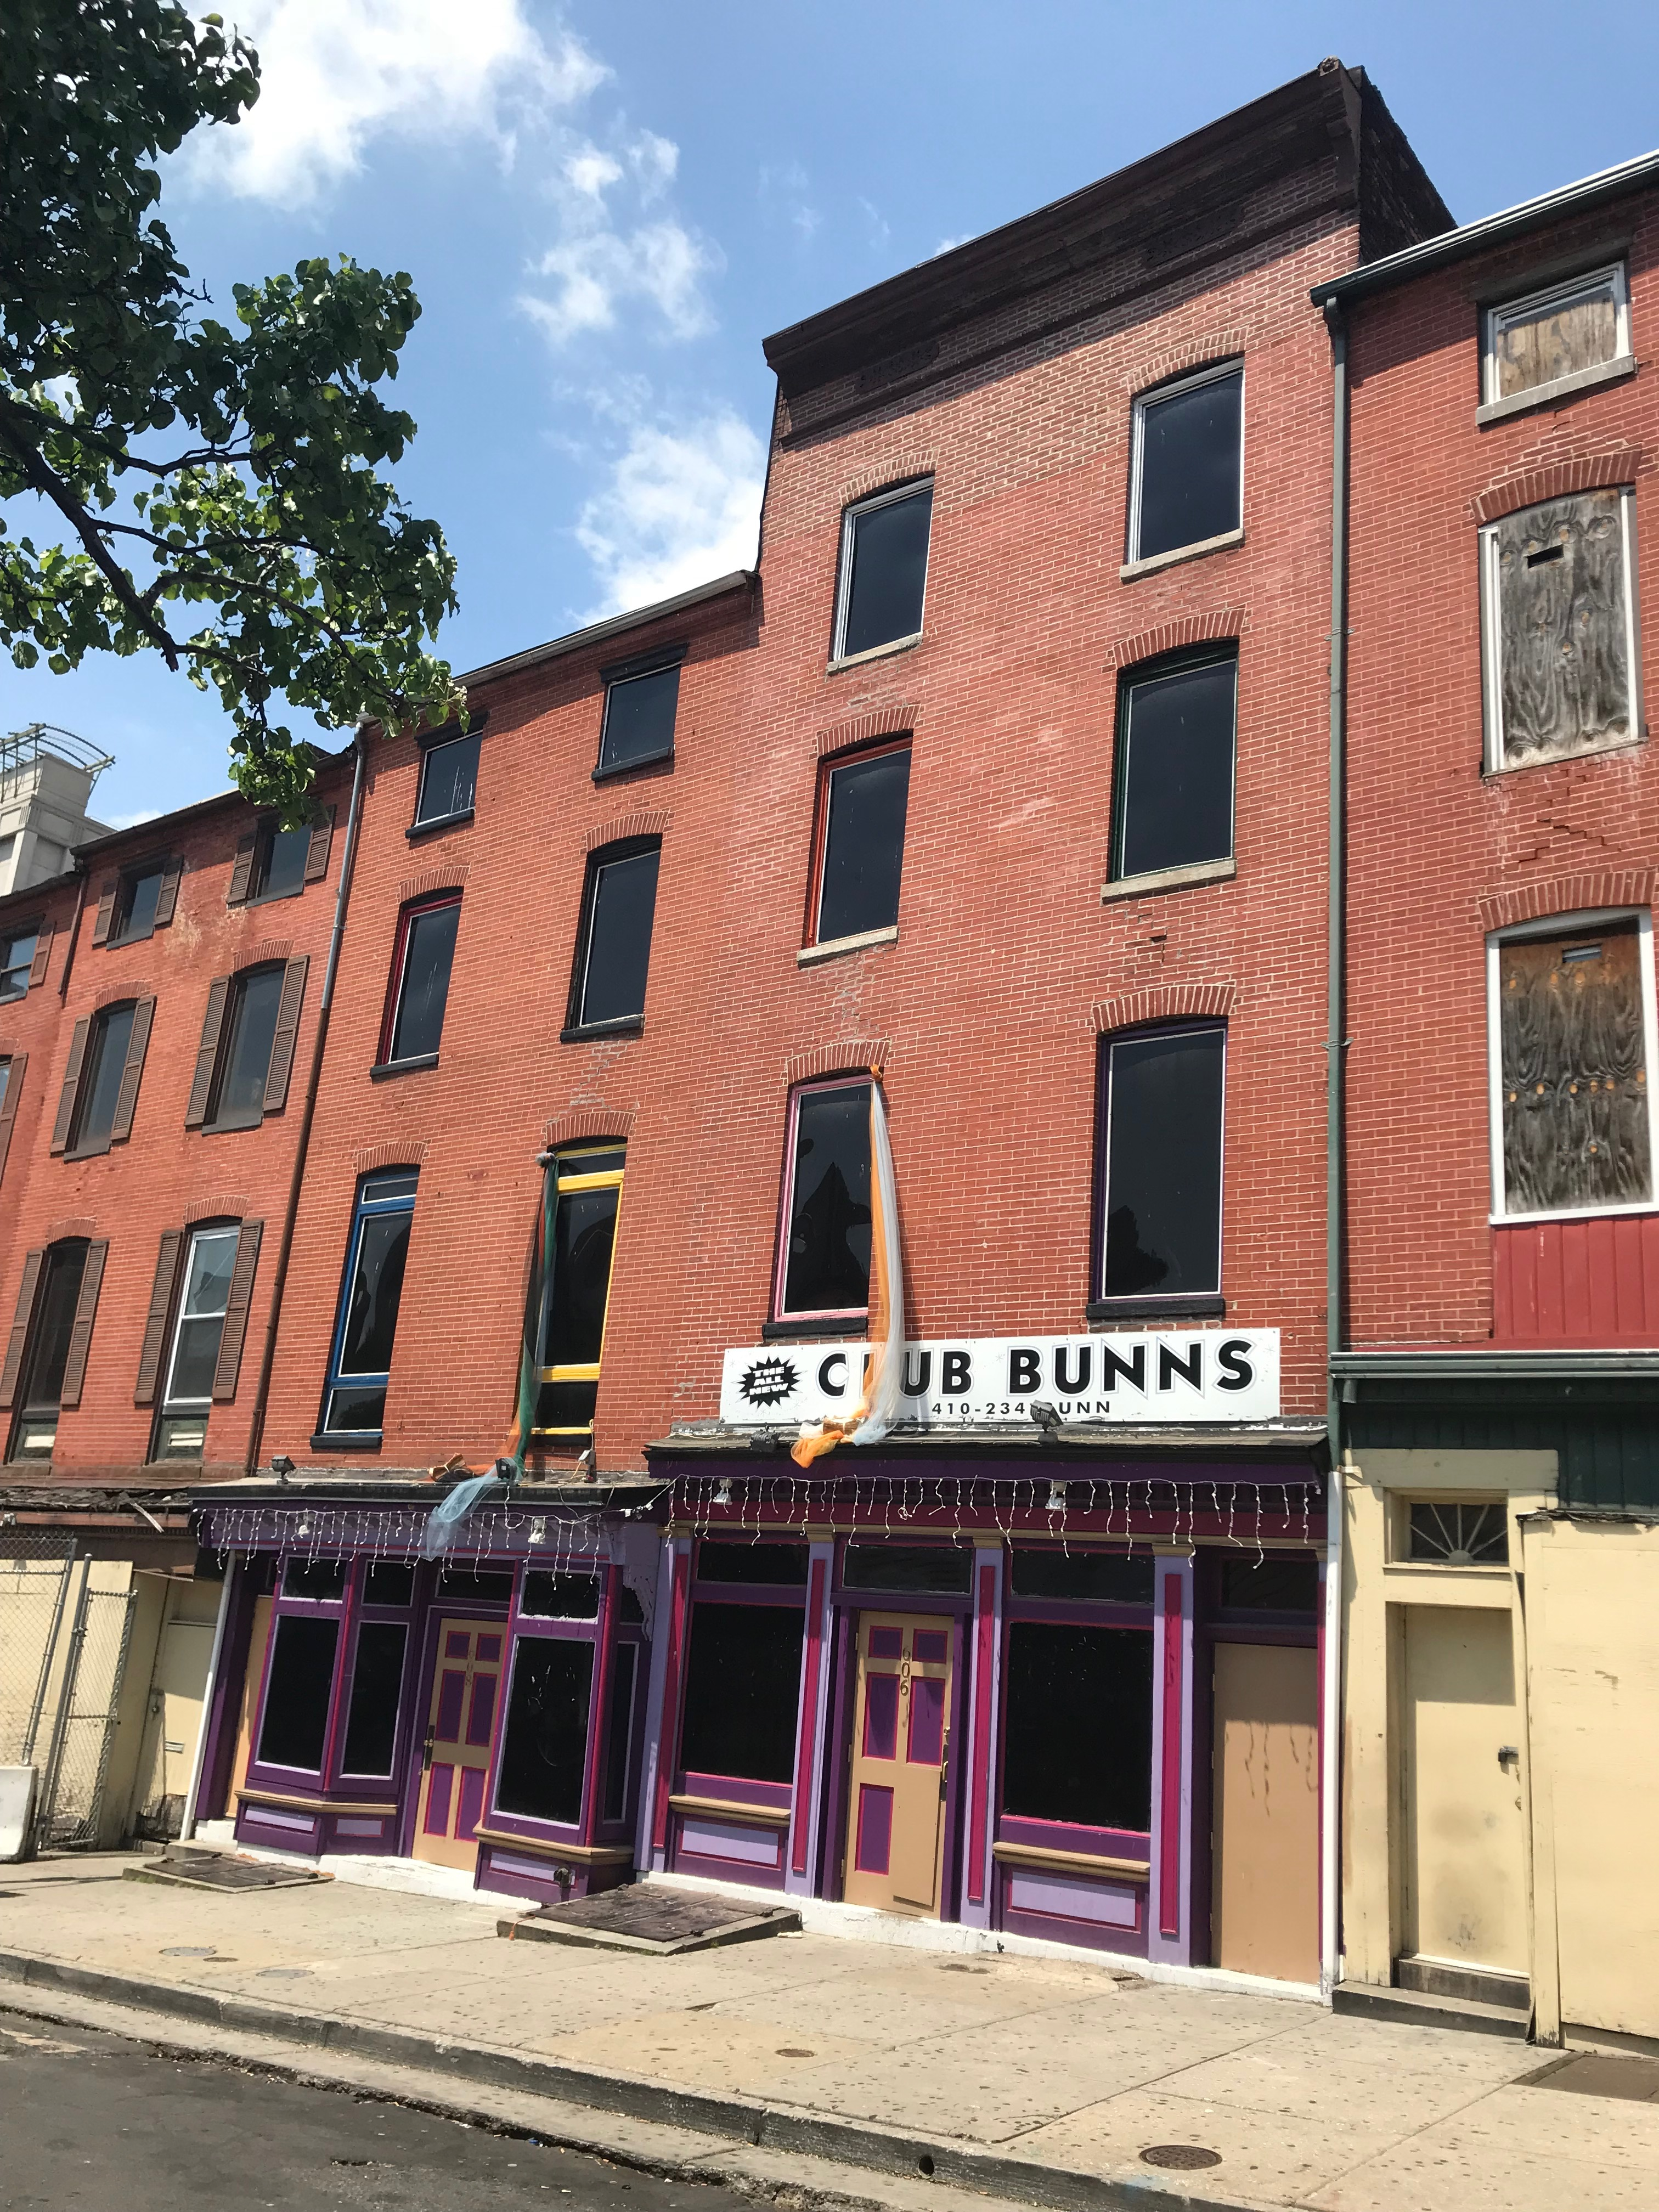 Club Bunns, 608 W. Lexington Street, Baltimore, MD 21201, Sky, Tree, Window, Maryland, HQ Photo